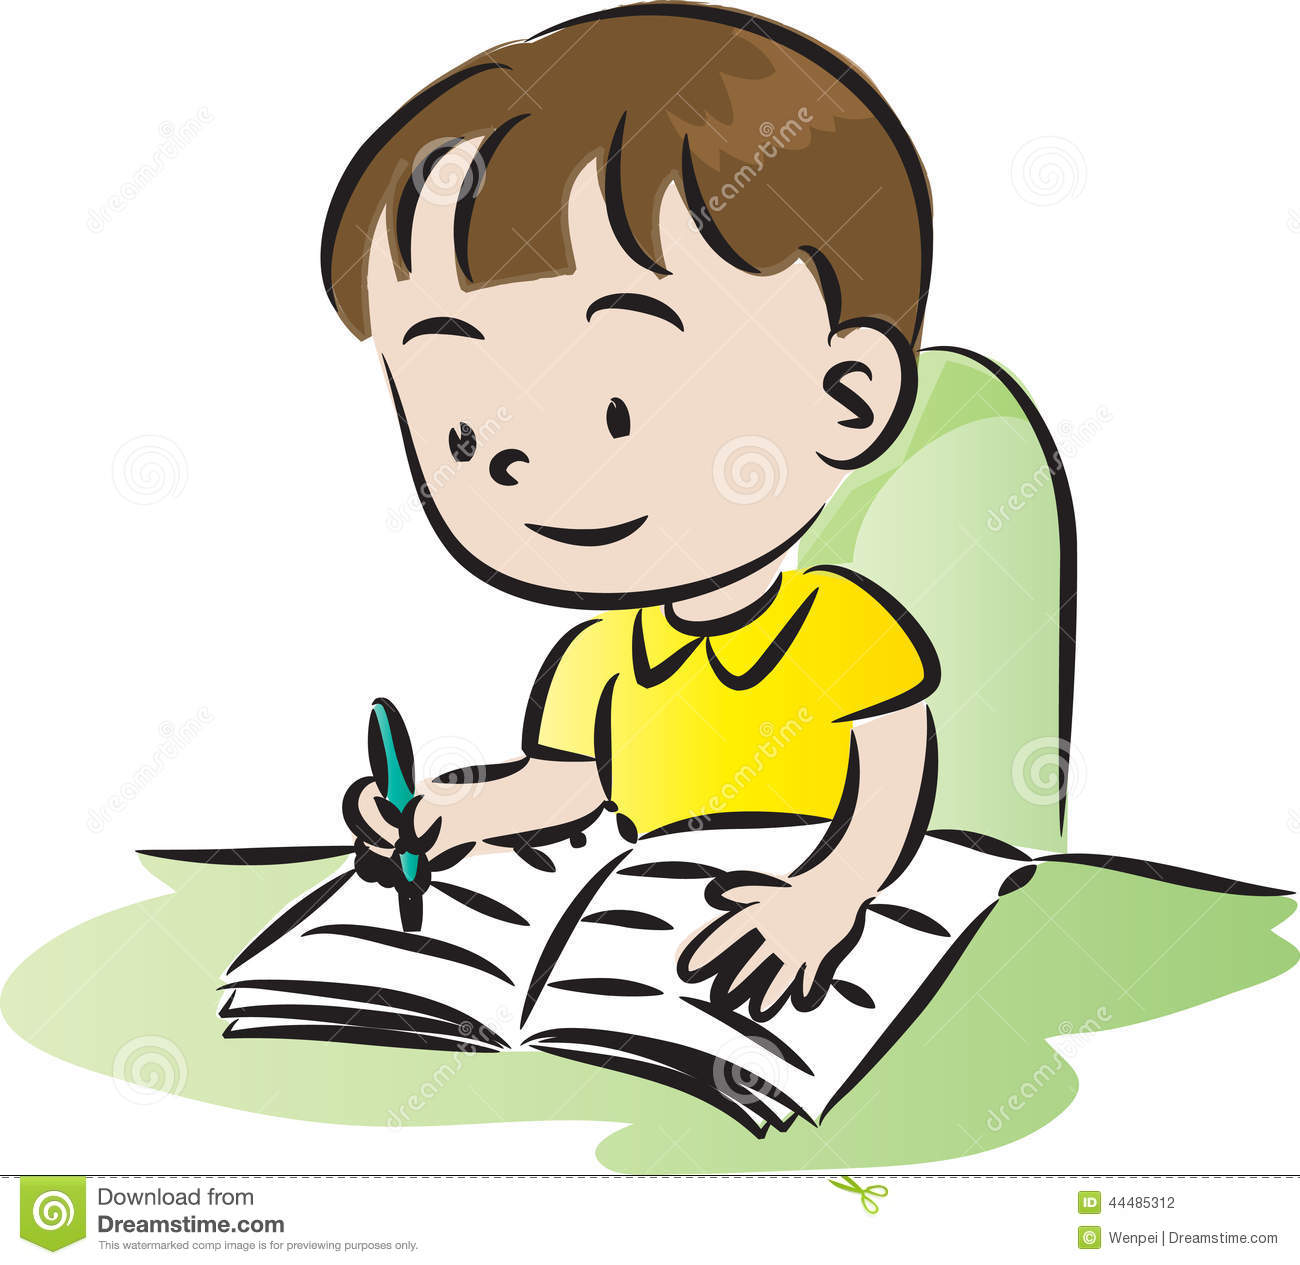 Homework clip art images